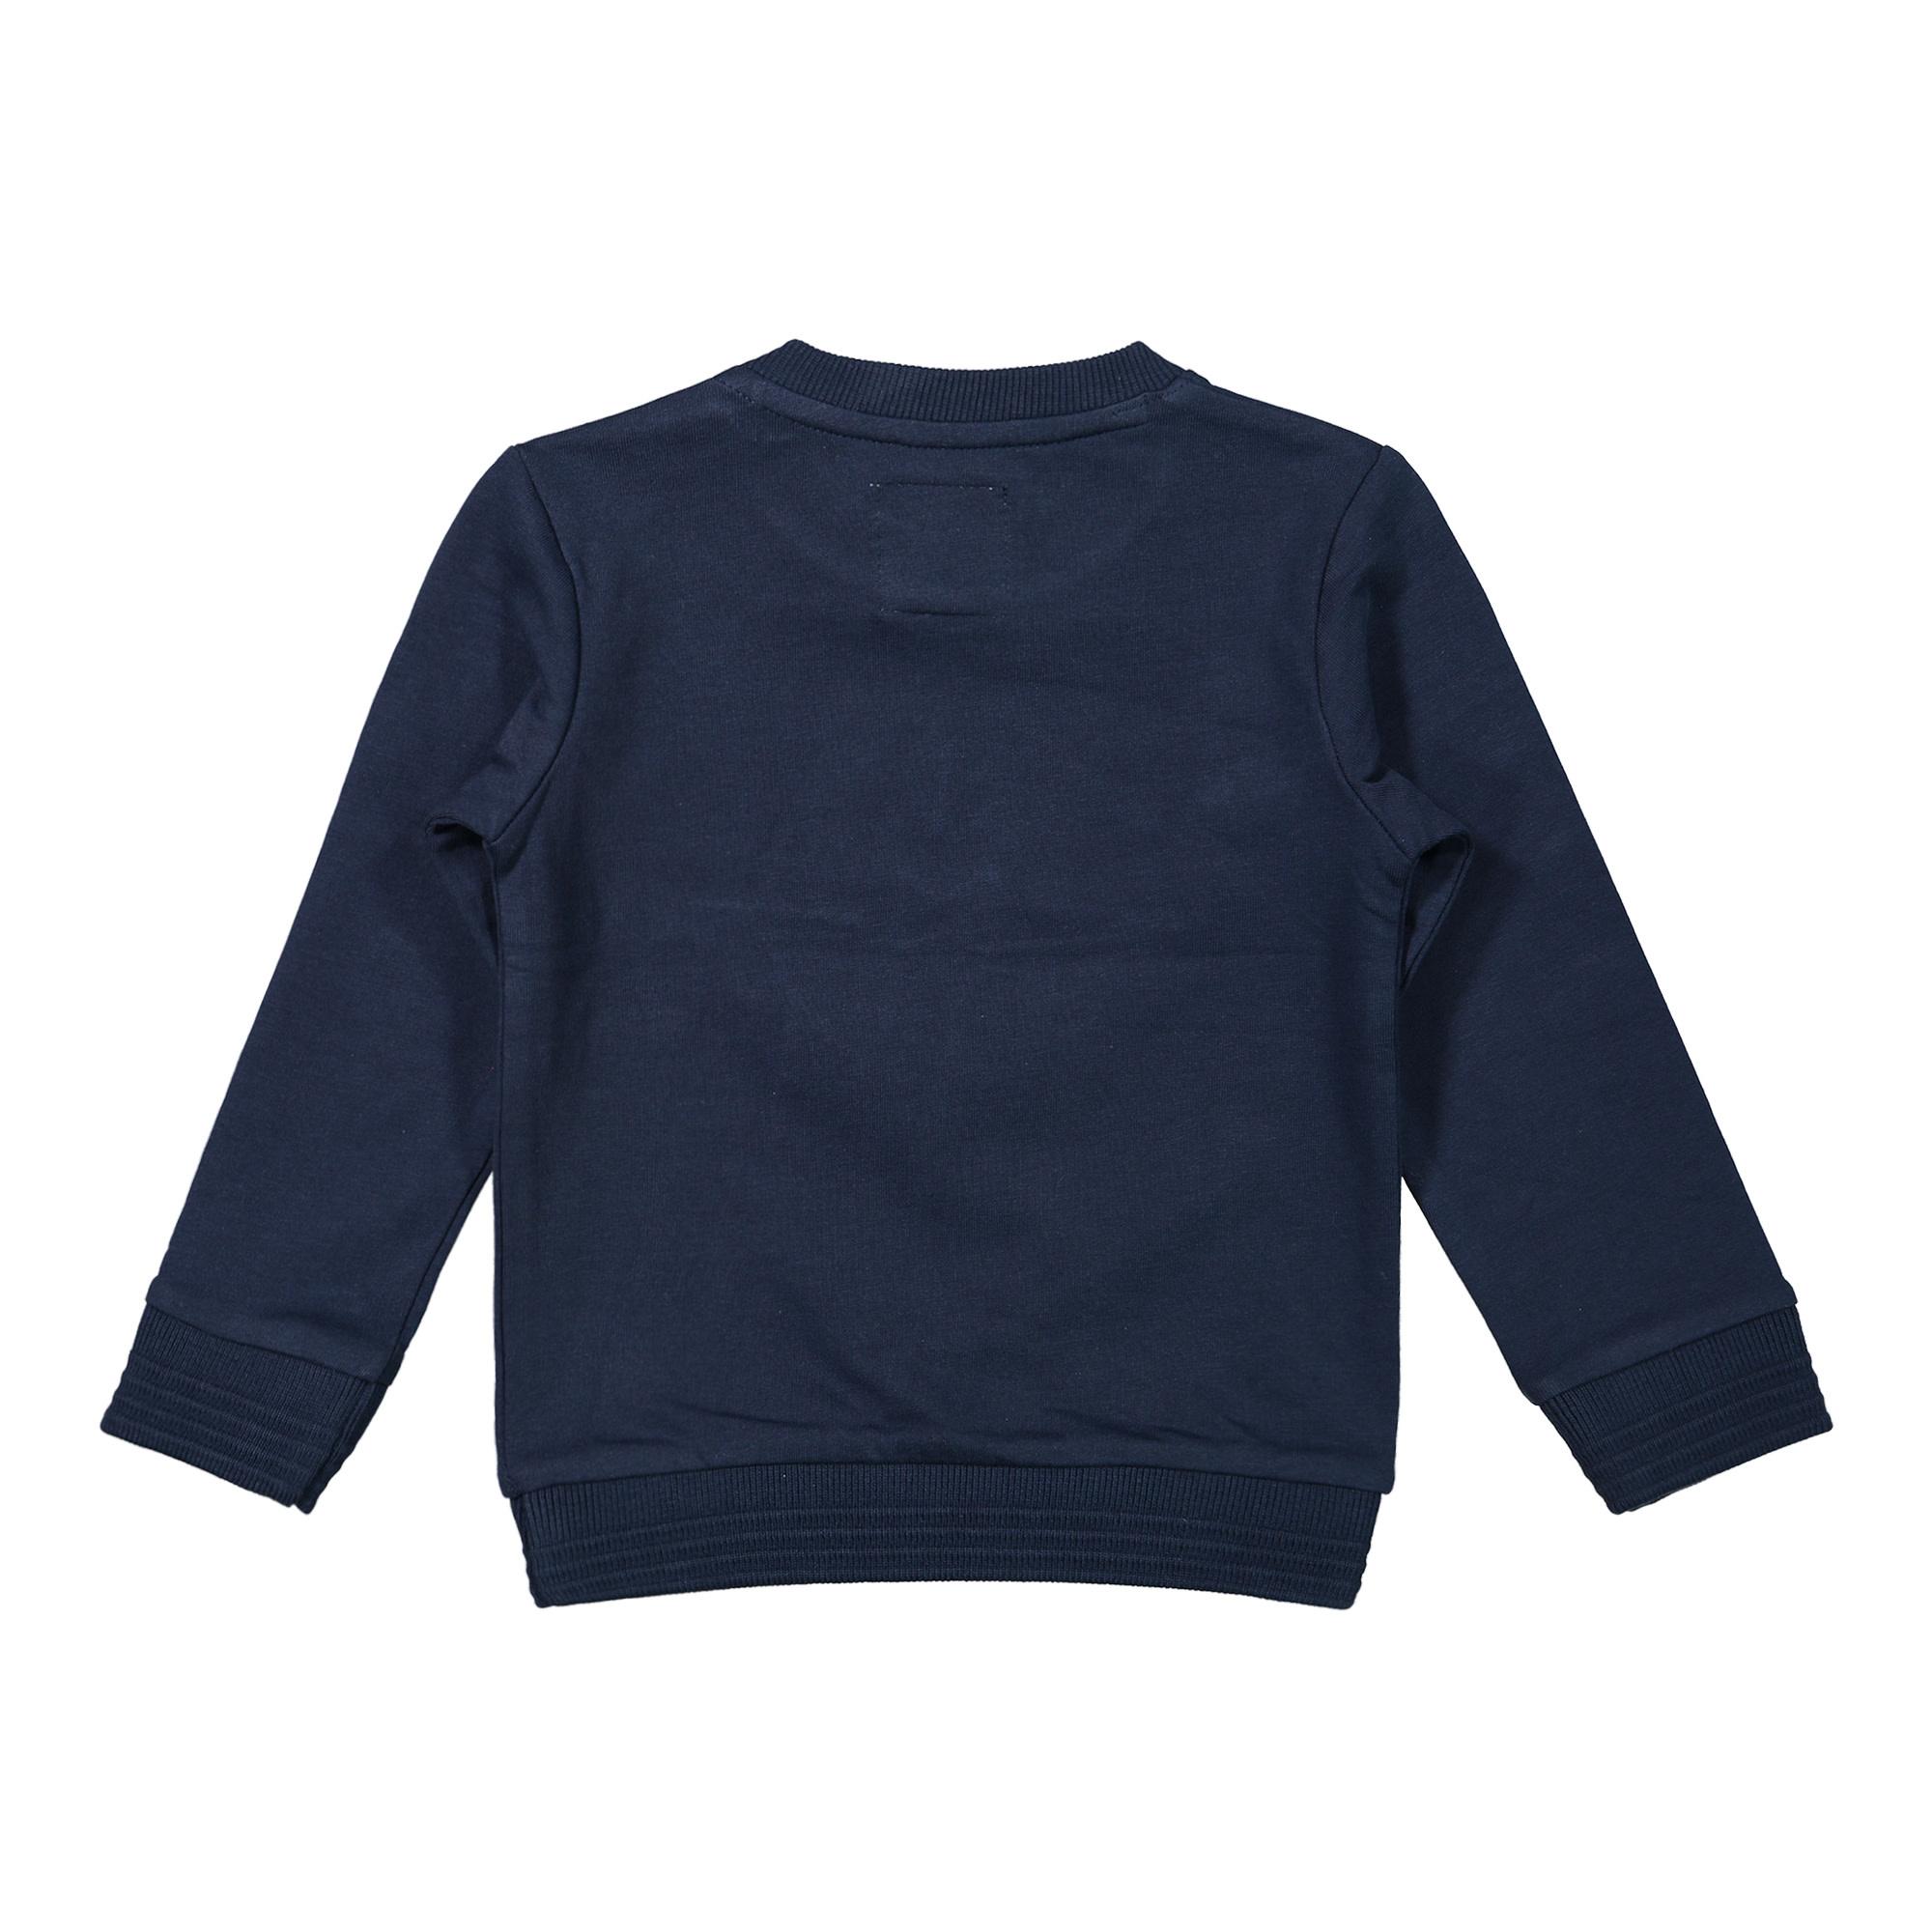 Compass Sweater